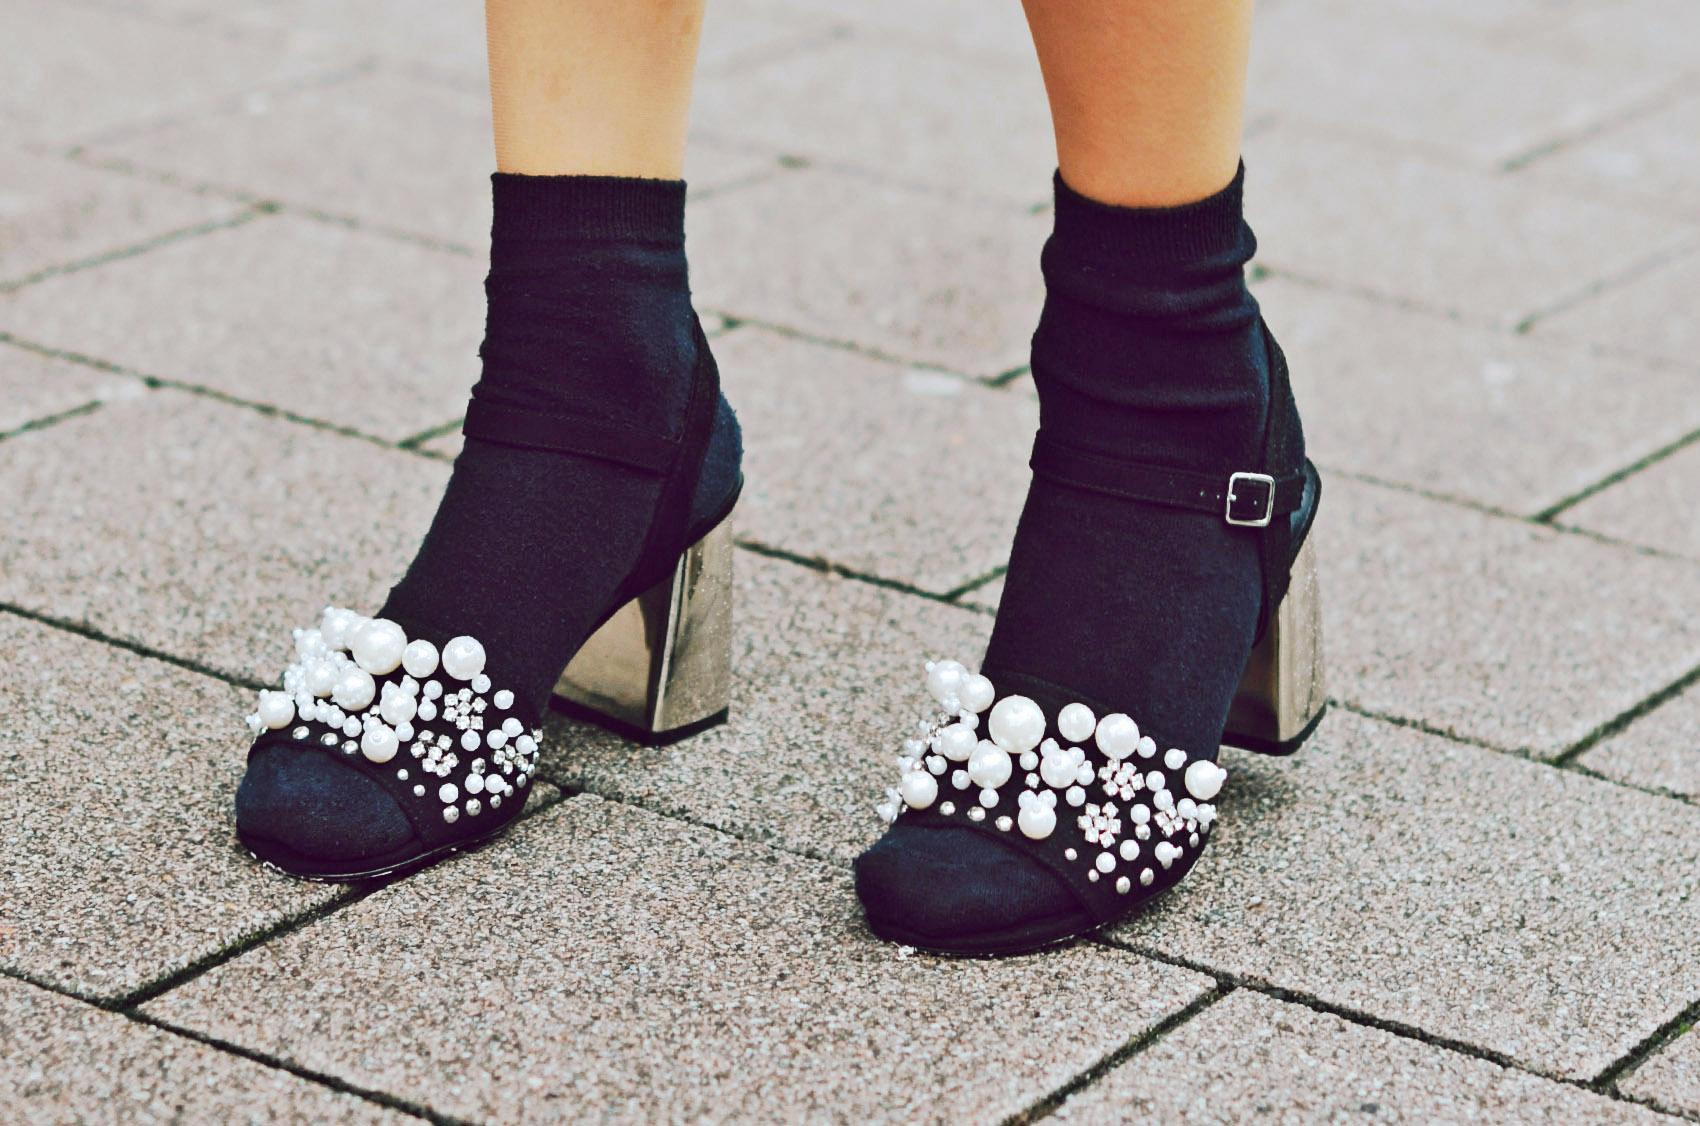 sandaletten mit perlen 1 vicky wanka fashionblog. Black Bedroom Furniture Sets. Home Design Ideas